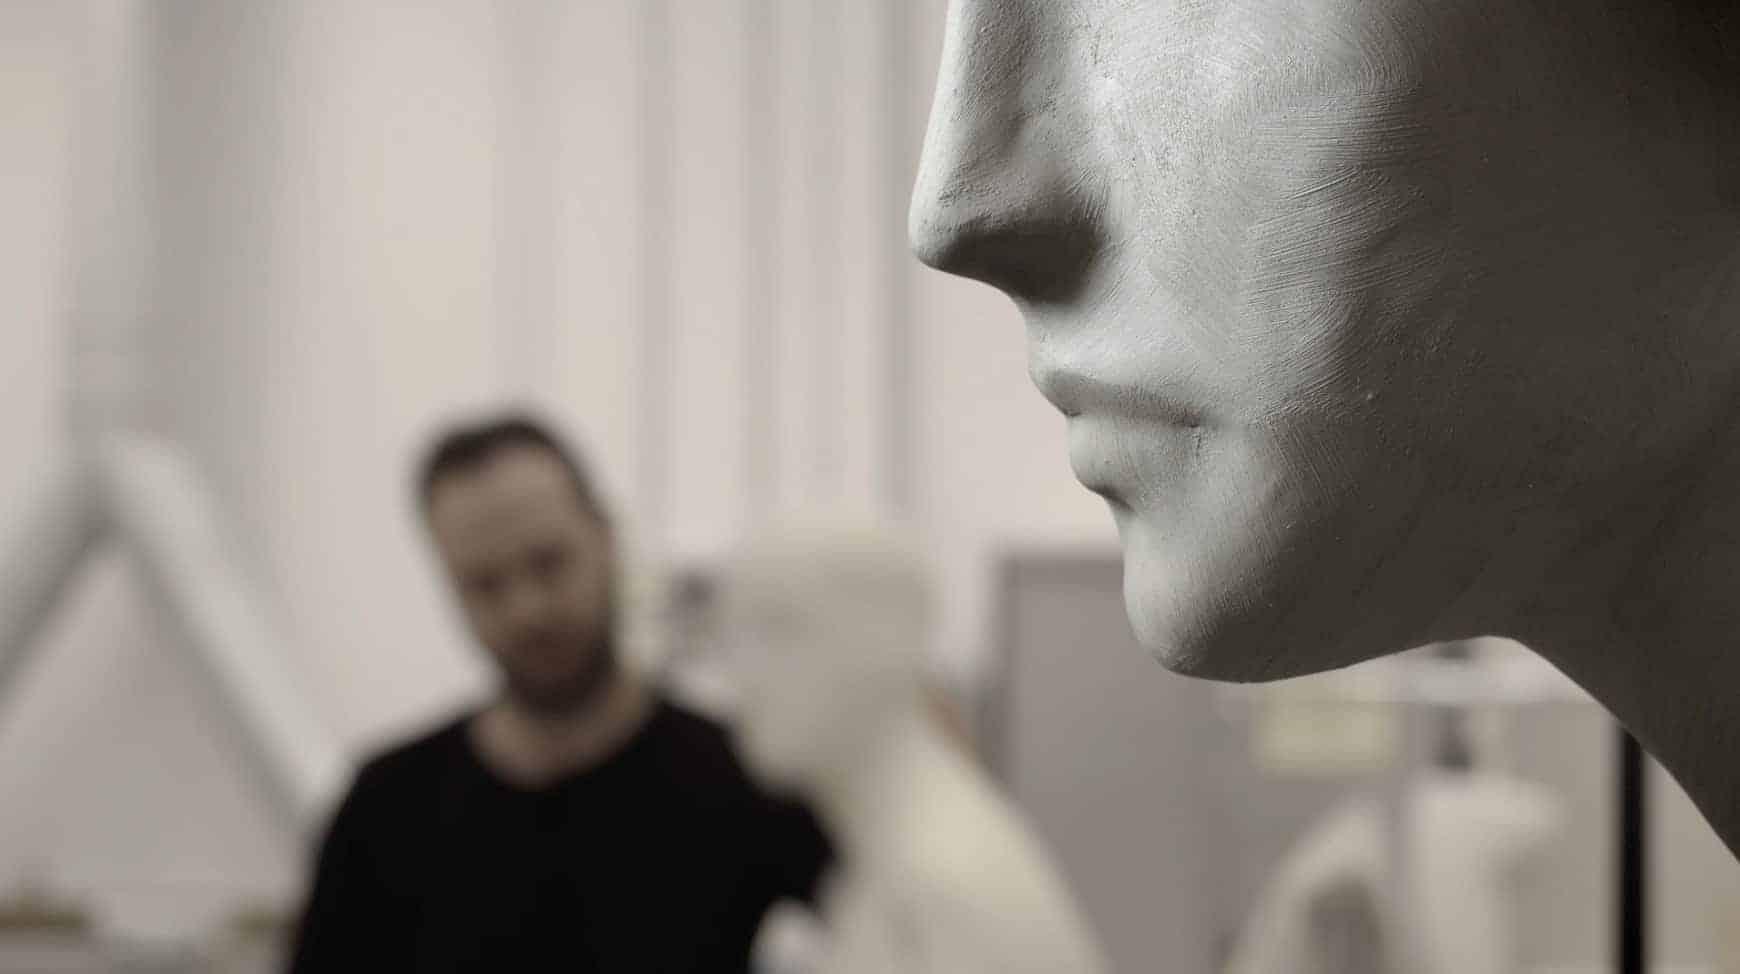 London launch of Noble, the new male Schläppi mannequin from Bonaveri